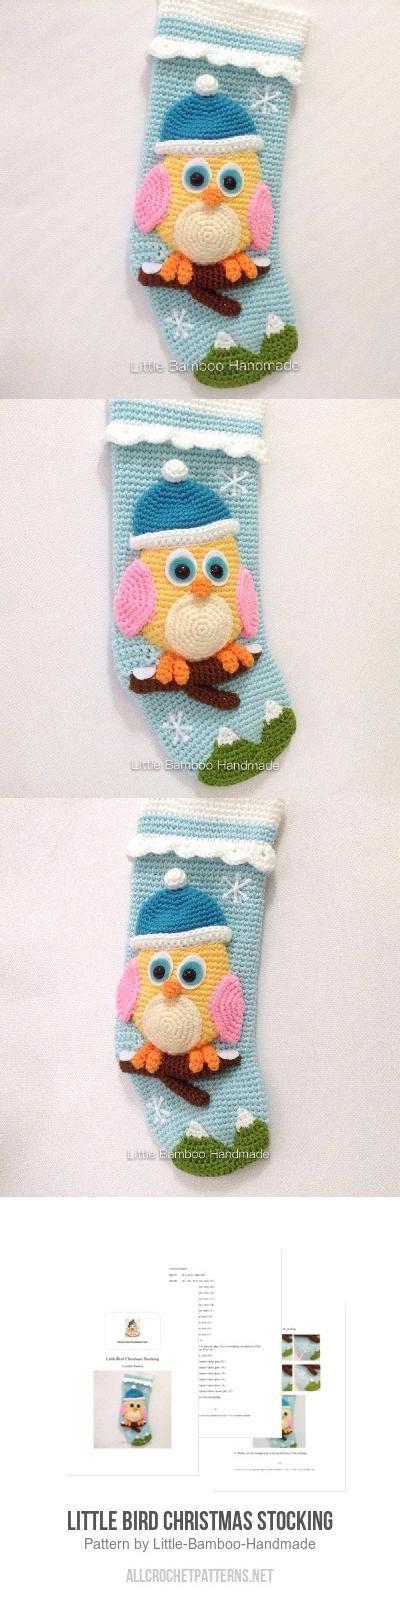 Little Bird Christmas Stocking Crochet Pattern for purchase